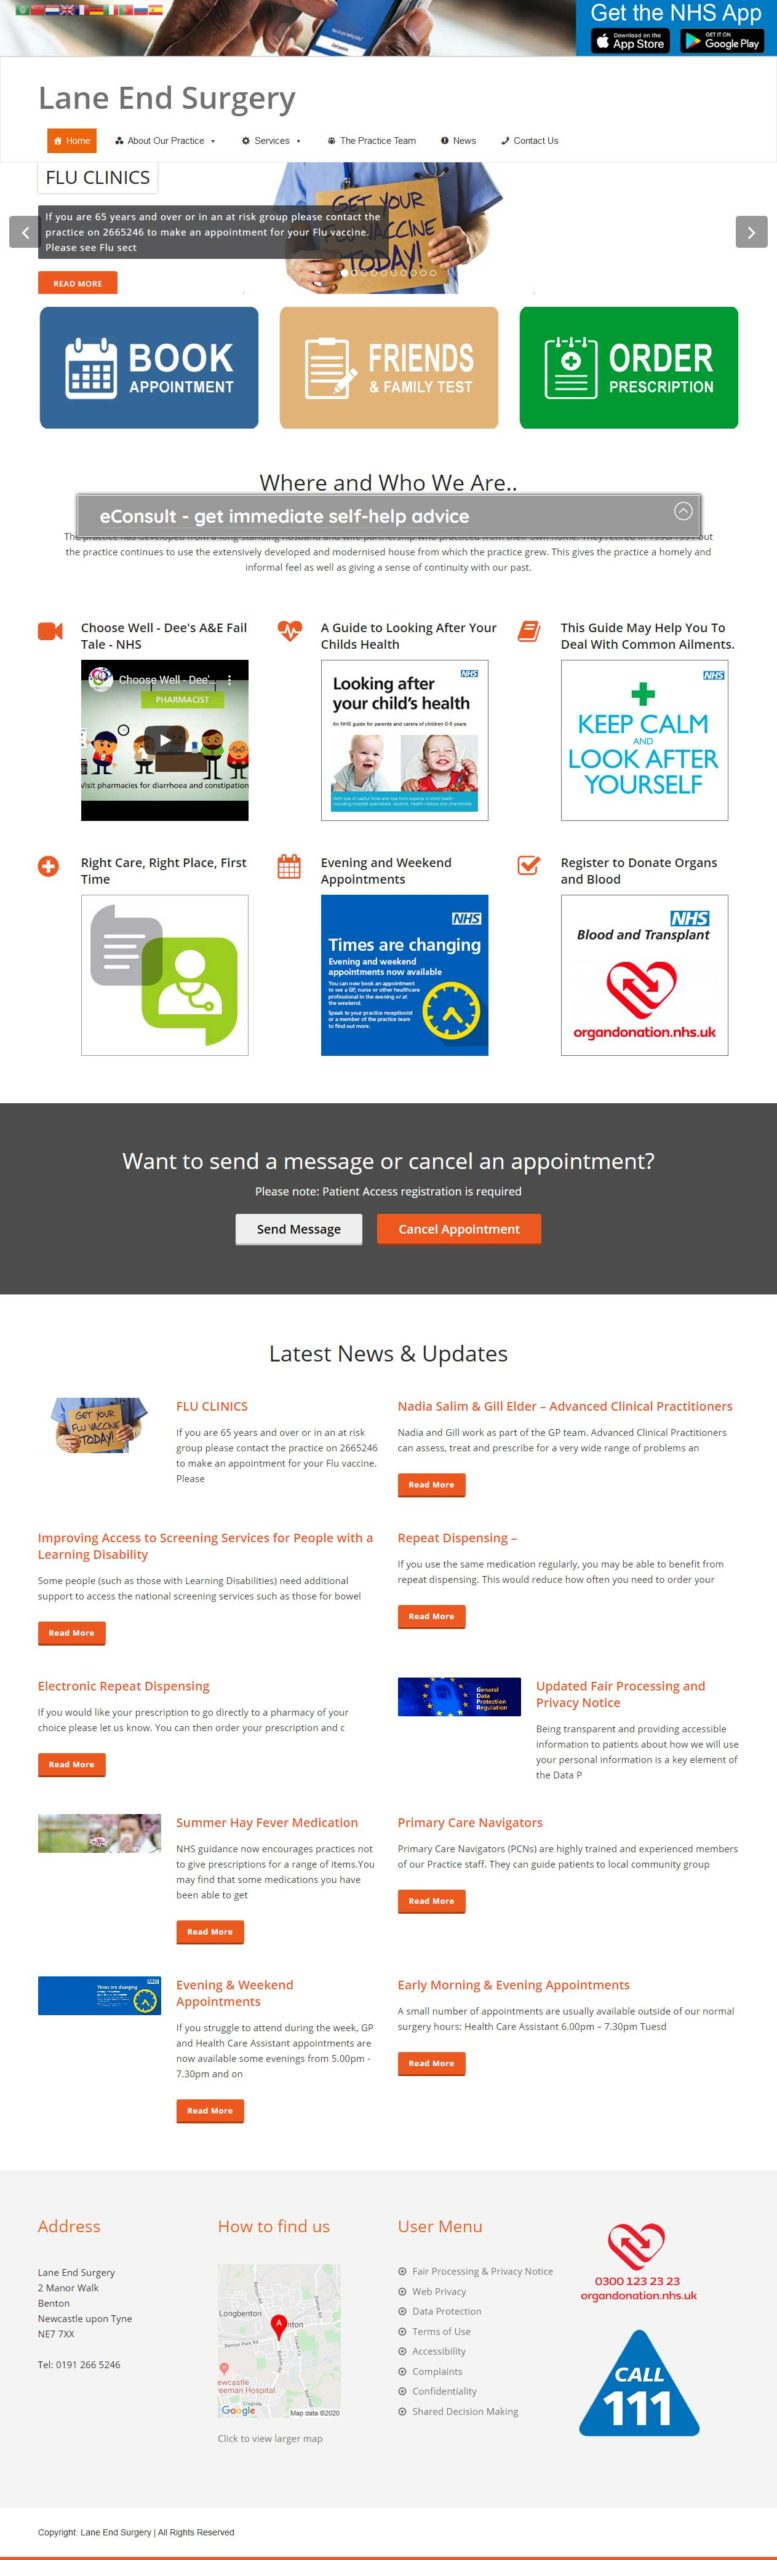 Lane End Surgery website